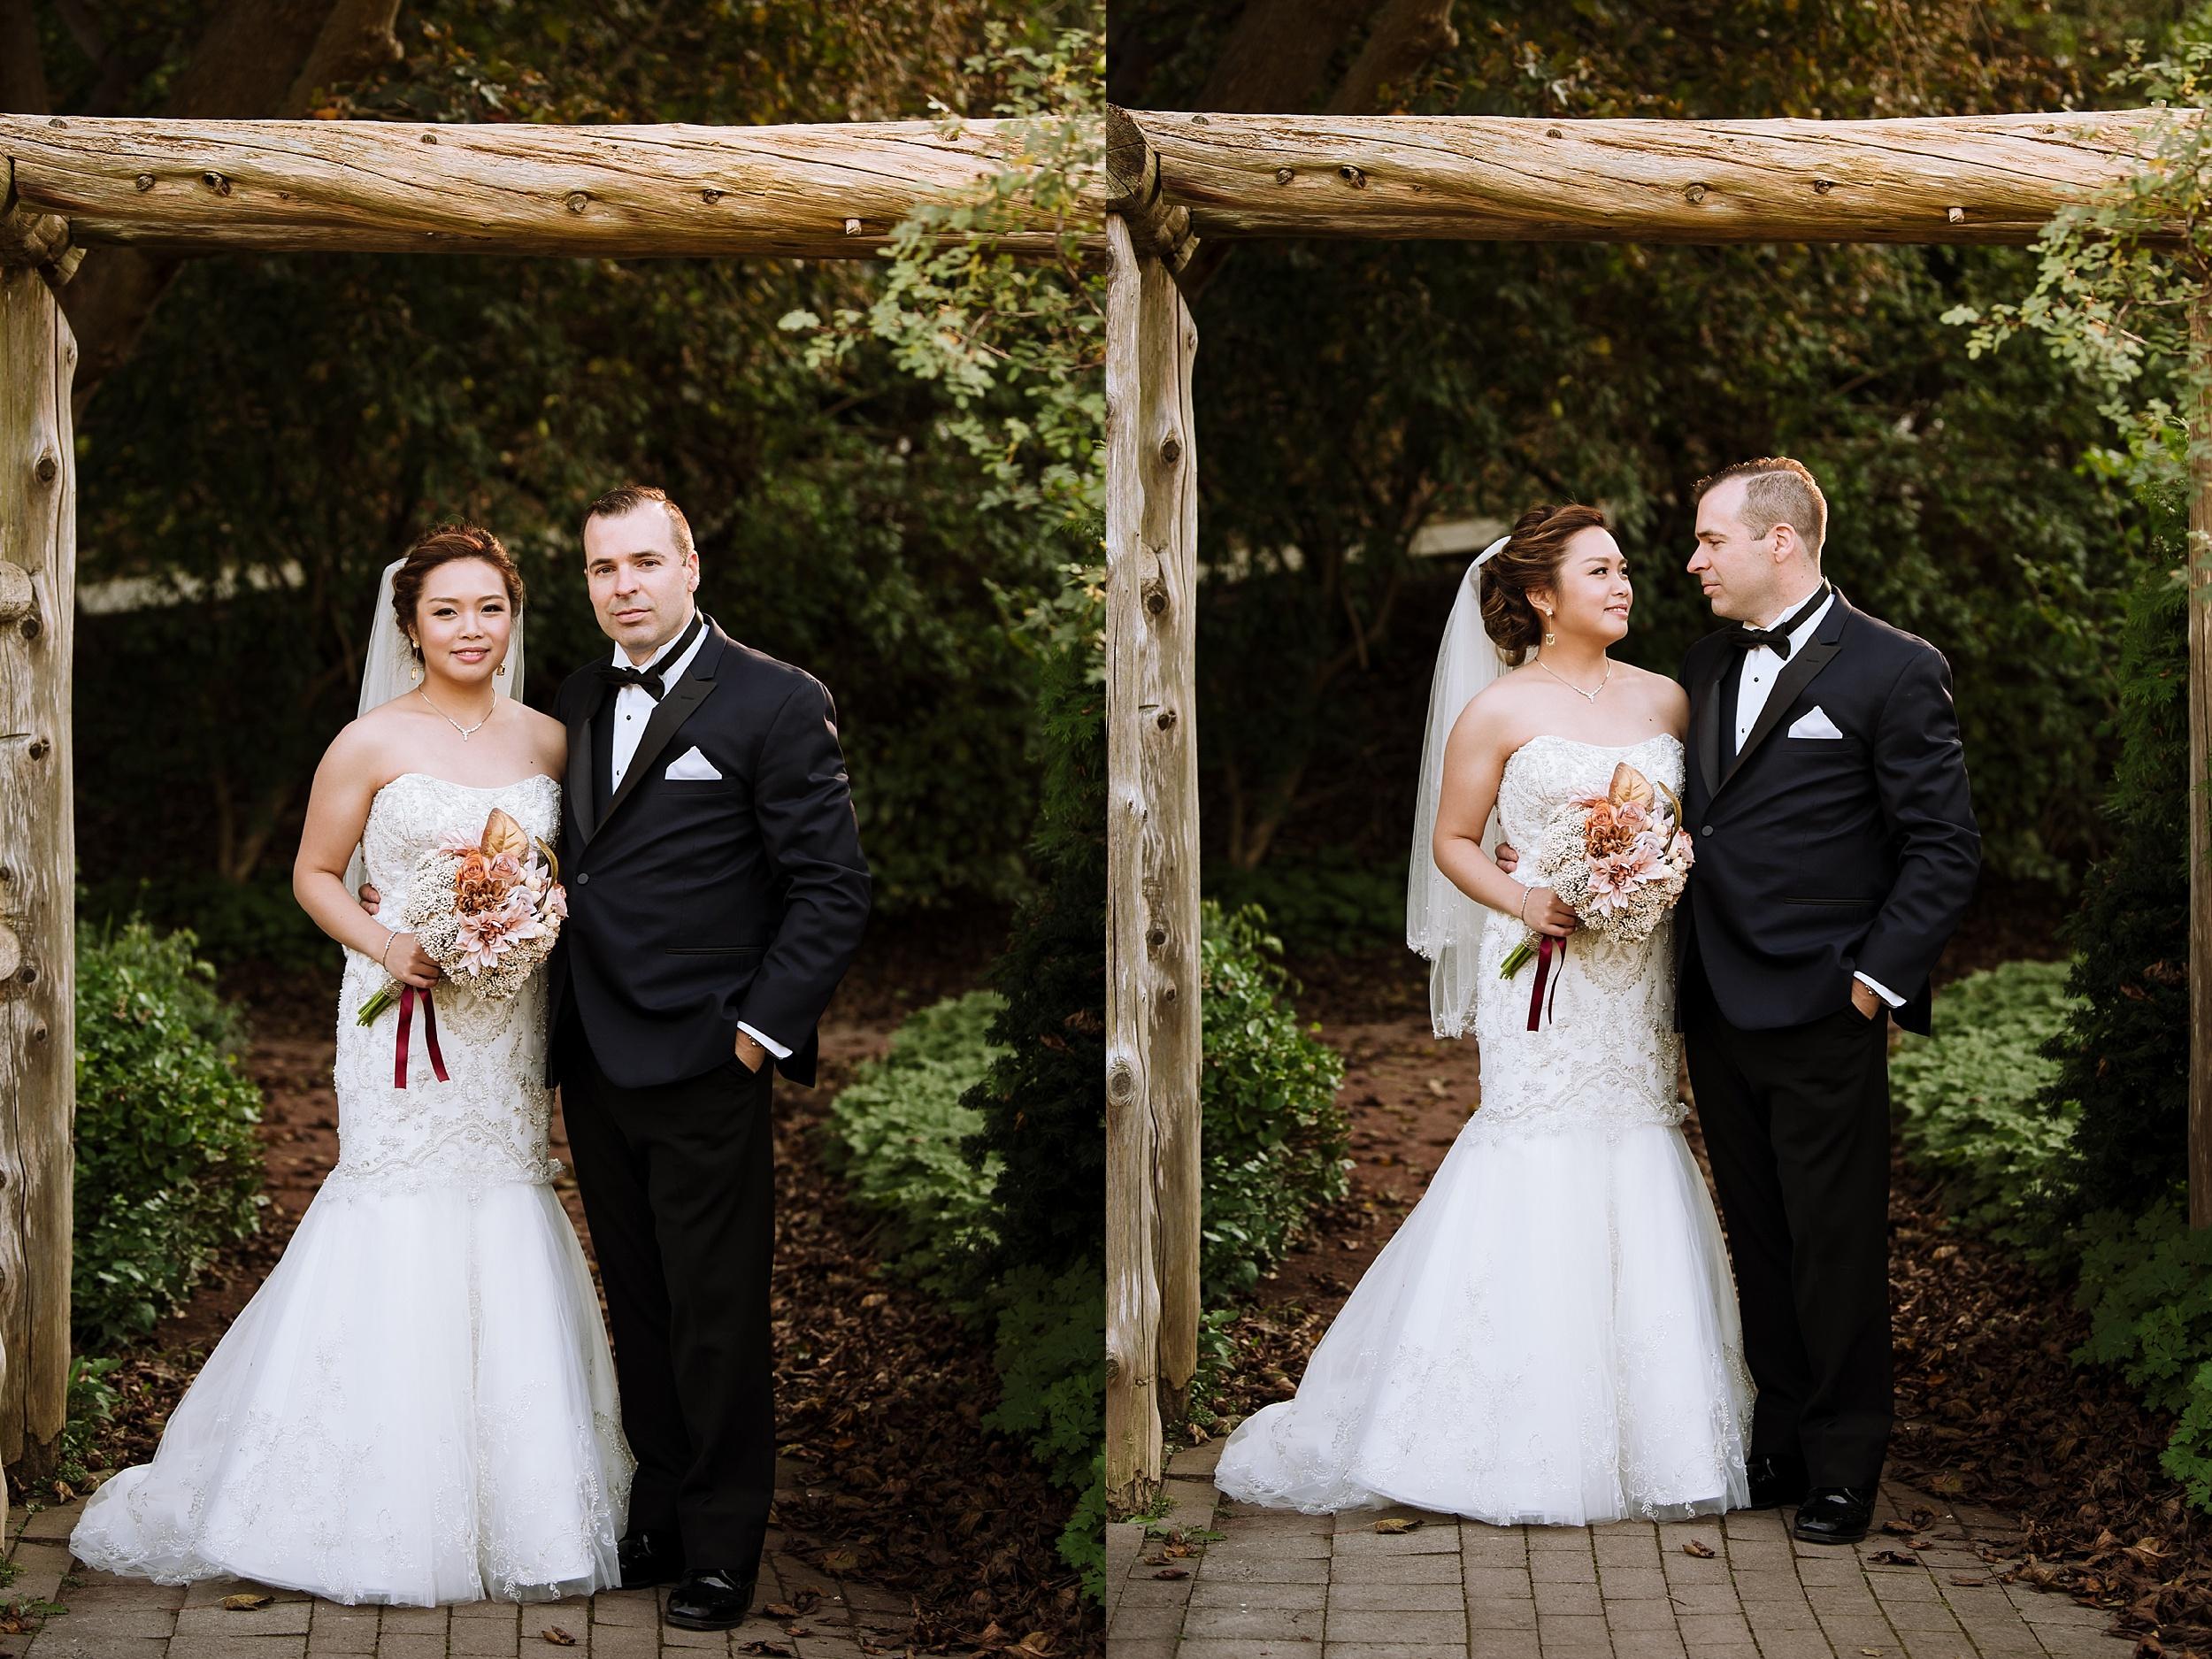 Sunnybrook_Estates_Alexander_Muir_Toronto_Wedding_Photographer_0008.jpg